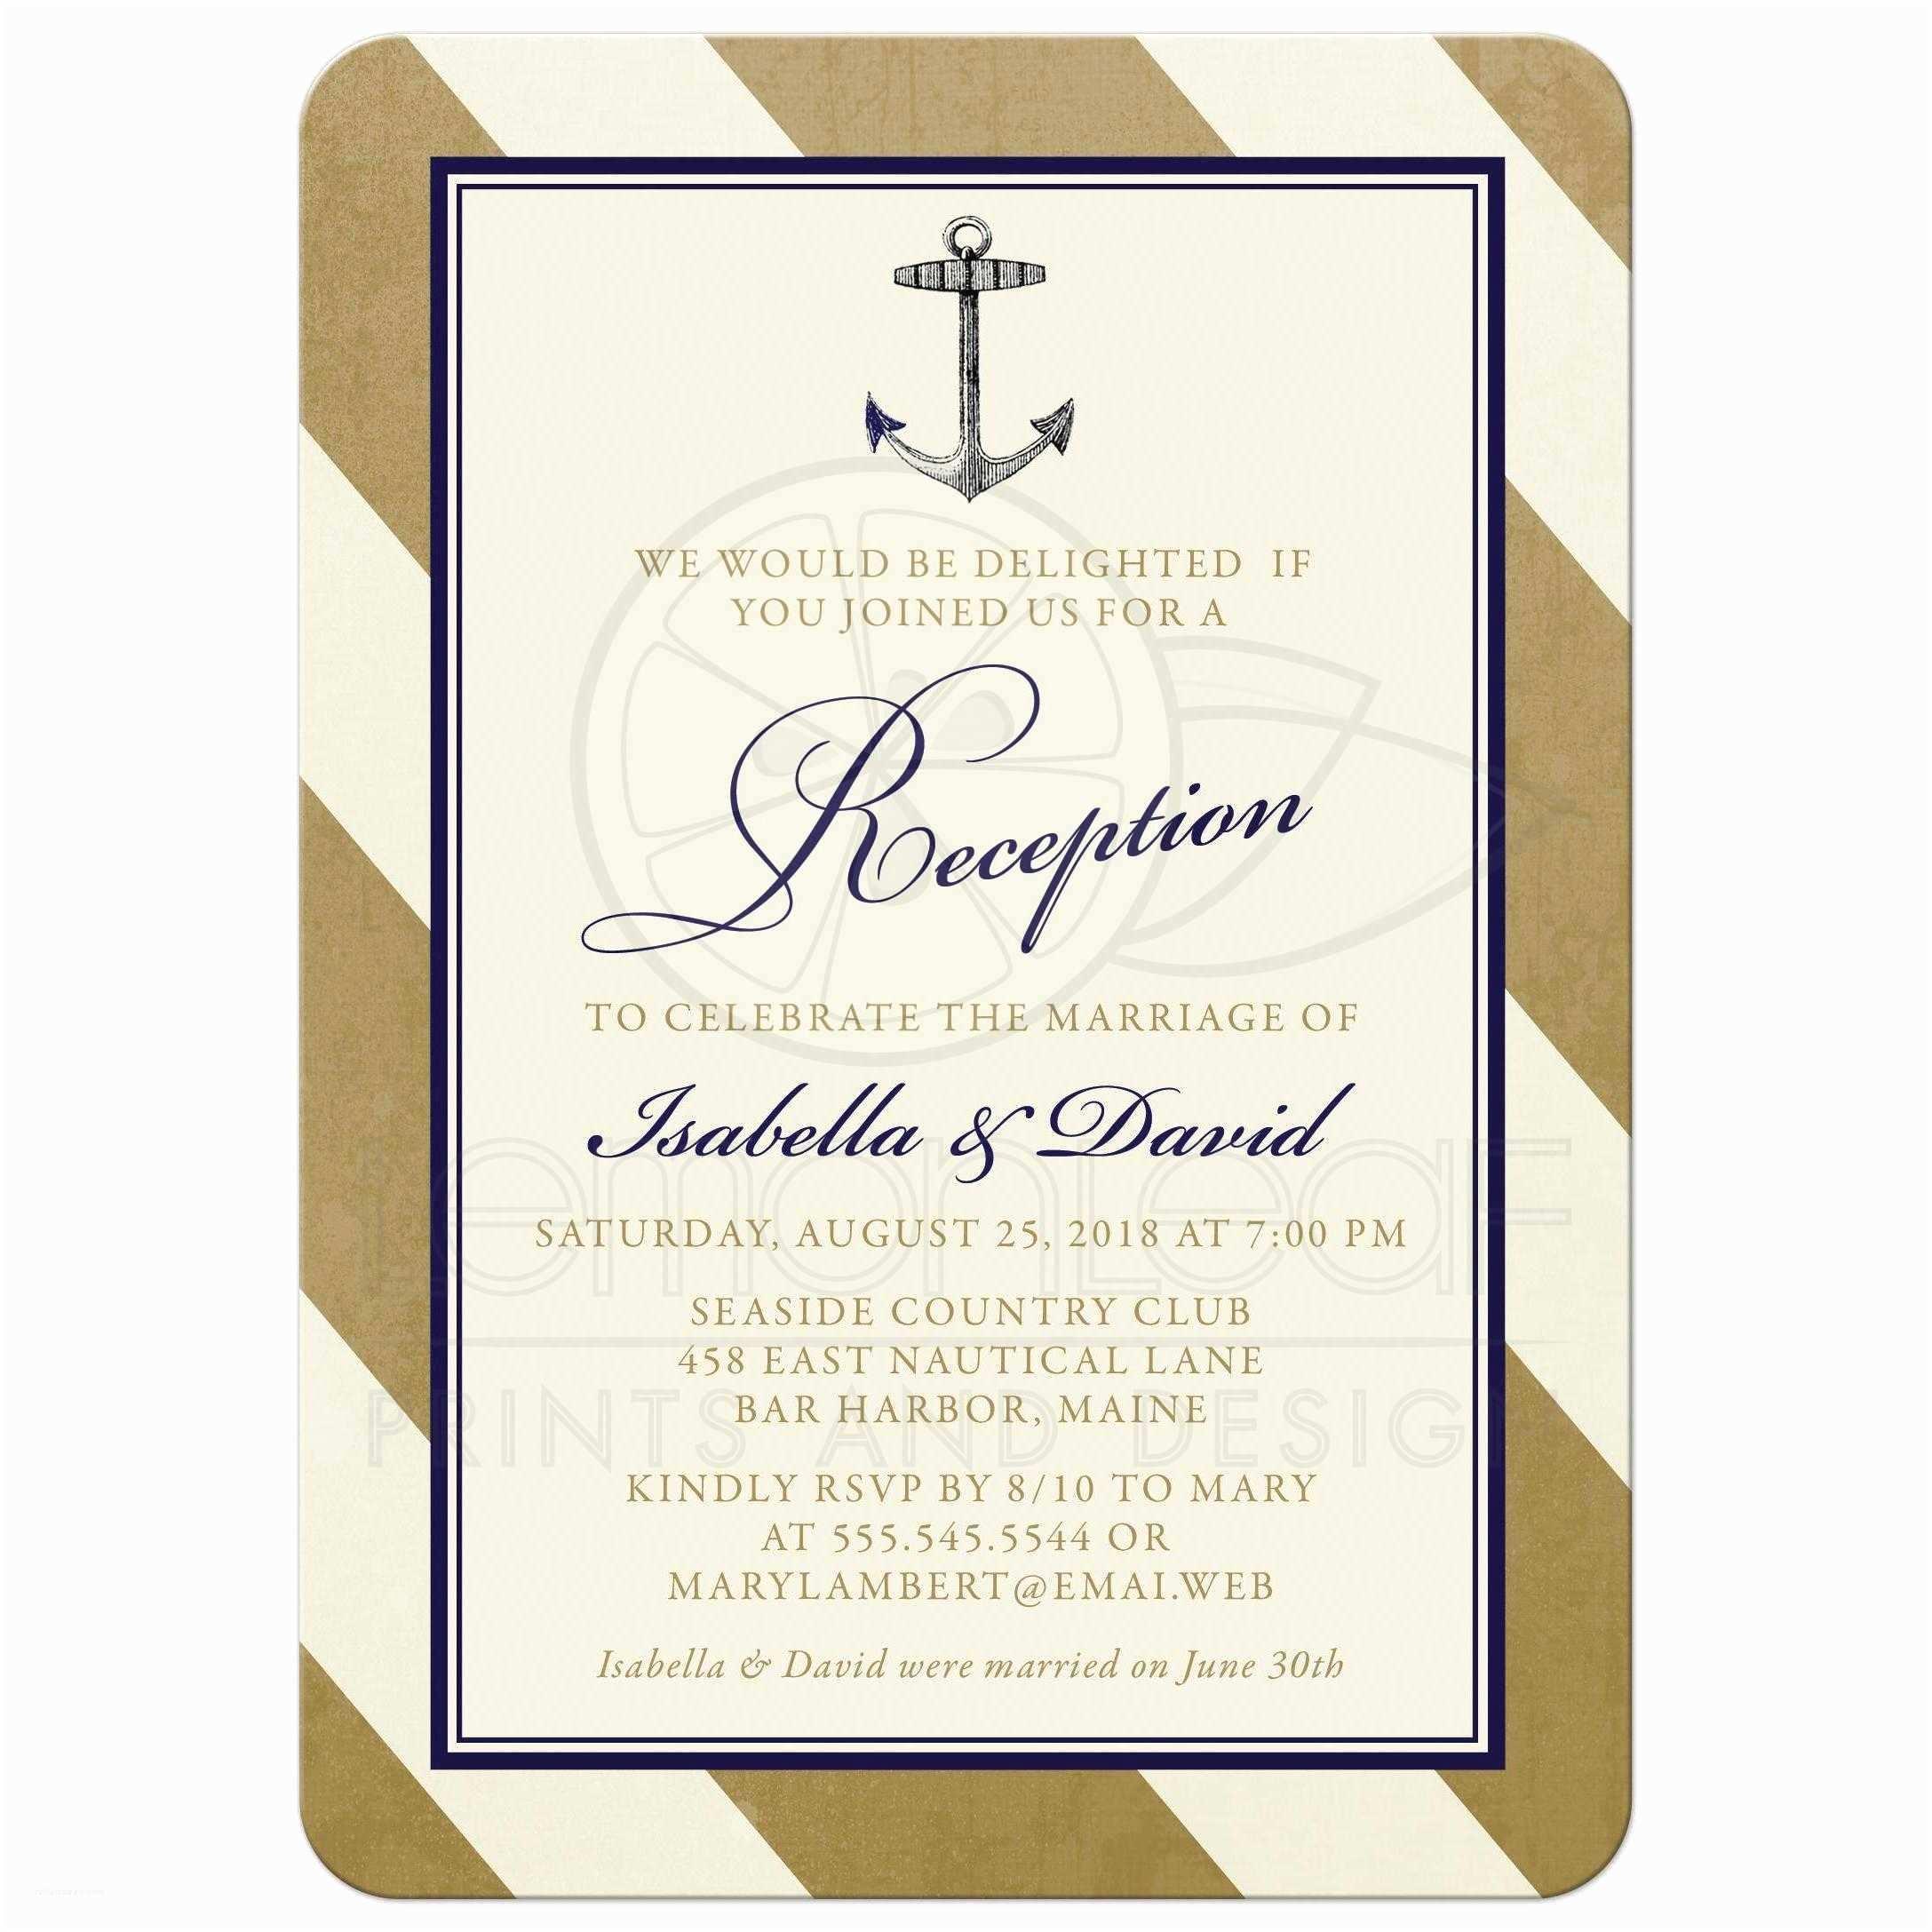 Post Wedding Celebration Invitations Post Wedding Party Invitations – Gangcraft